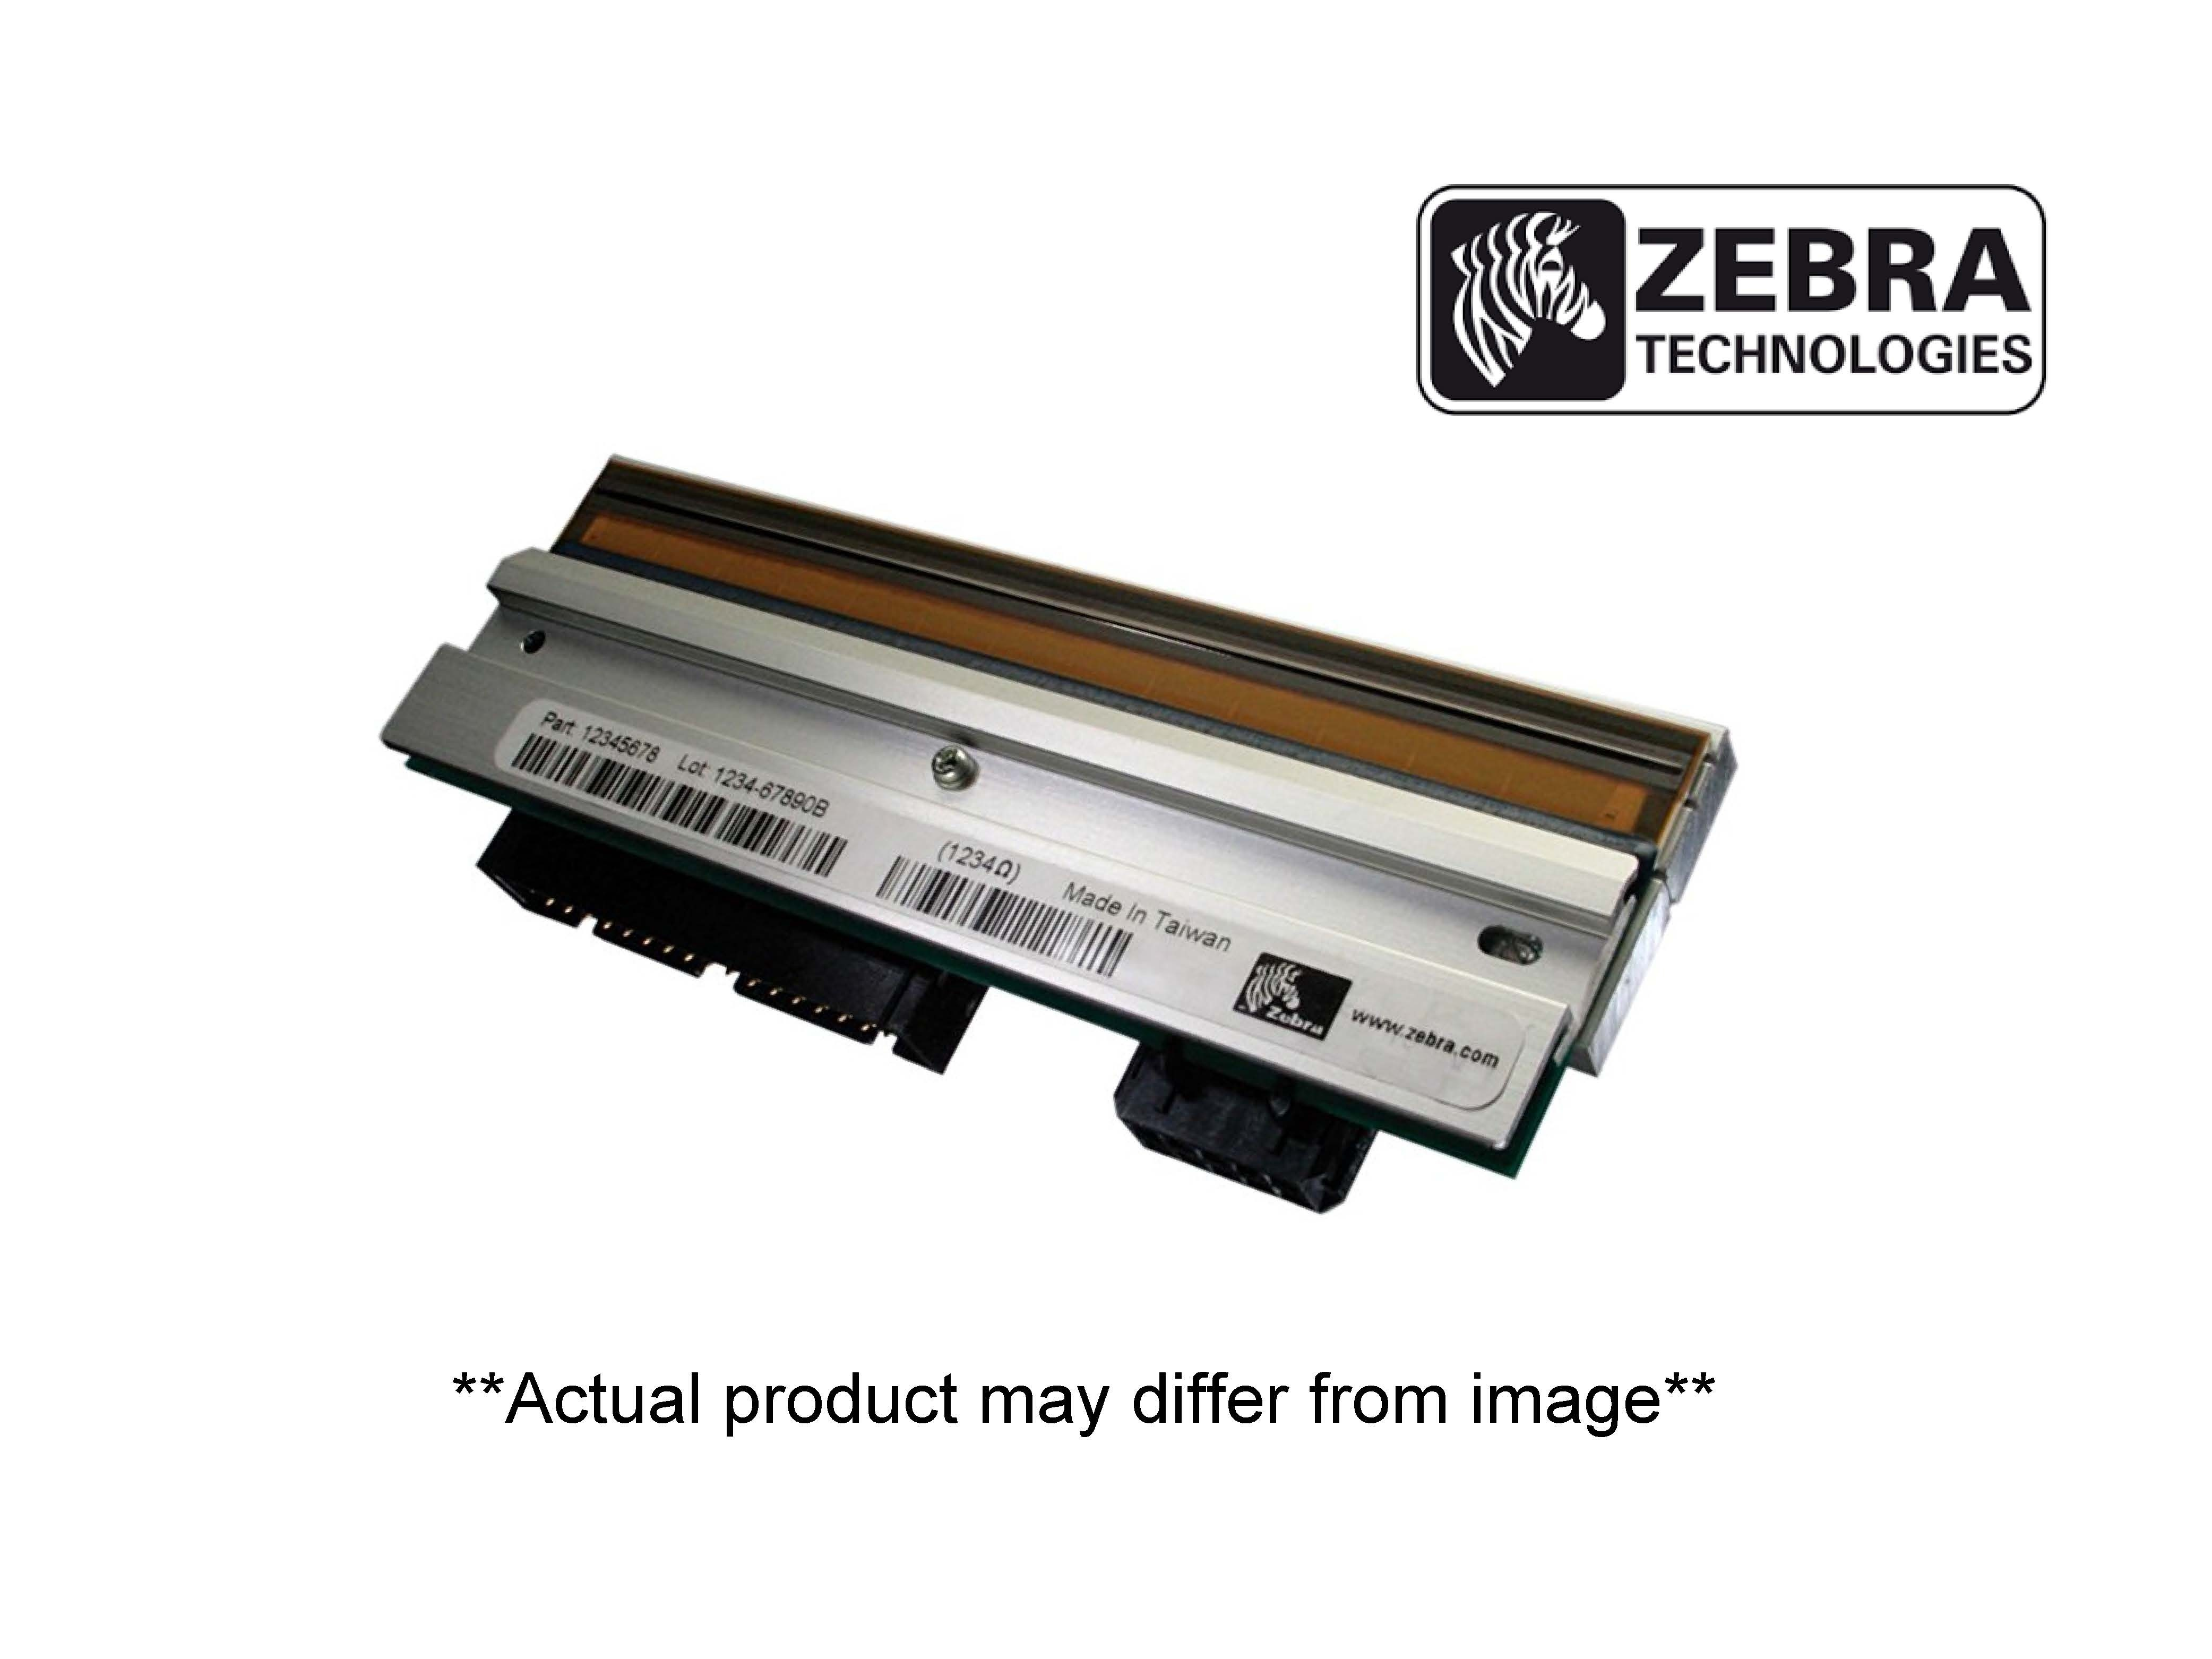 Zebra GK420d Printhead - Blanco Labels